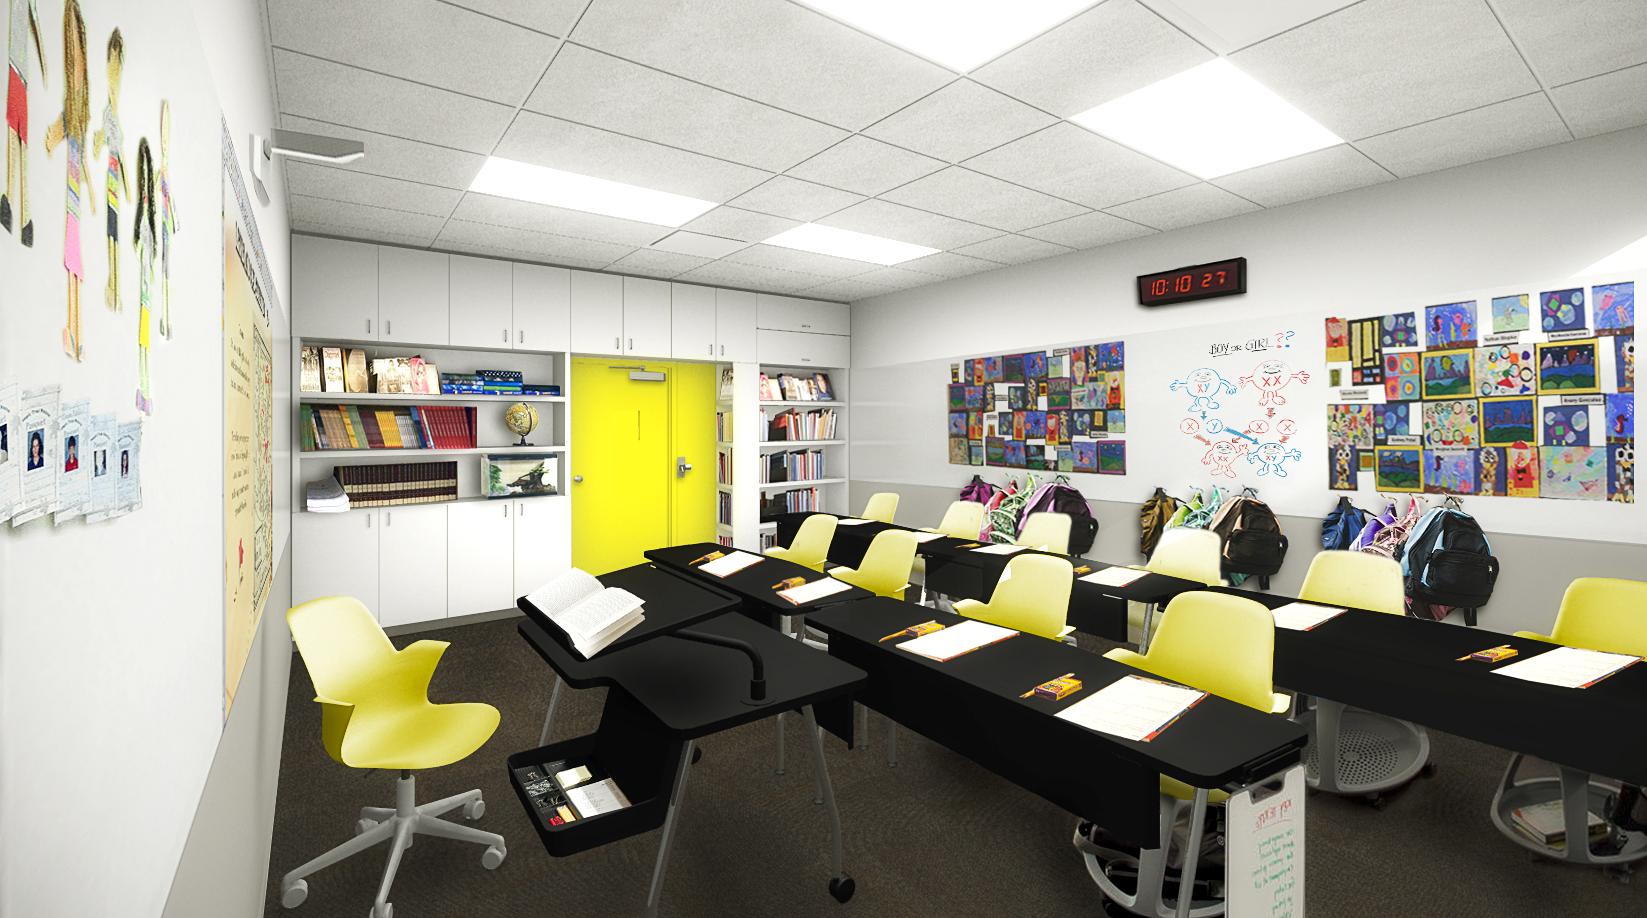 Bodine classroom_view2.jpg